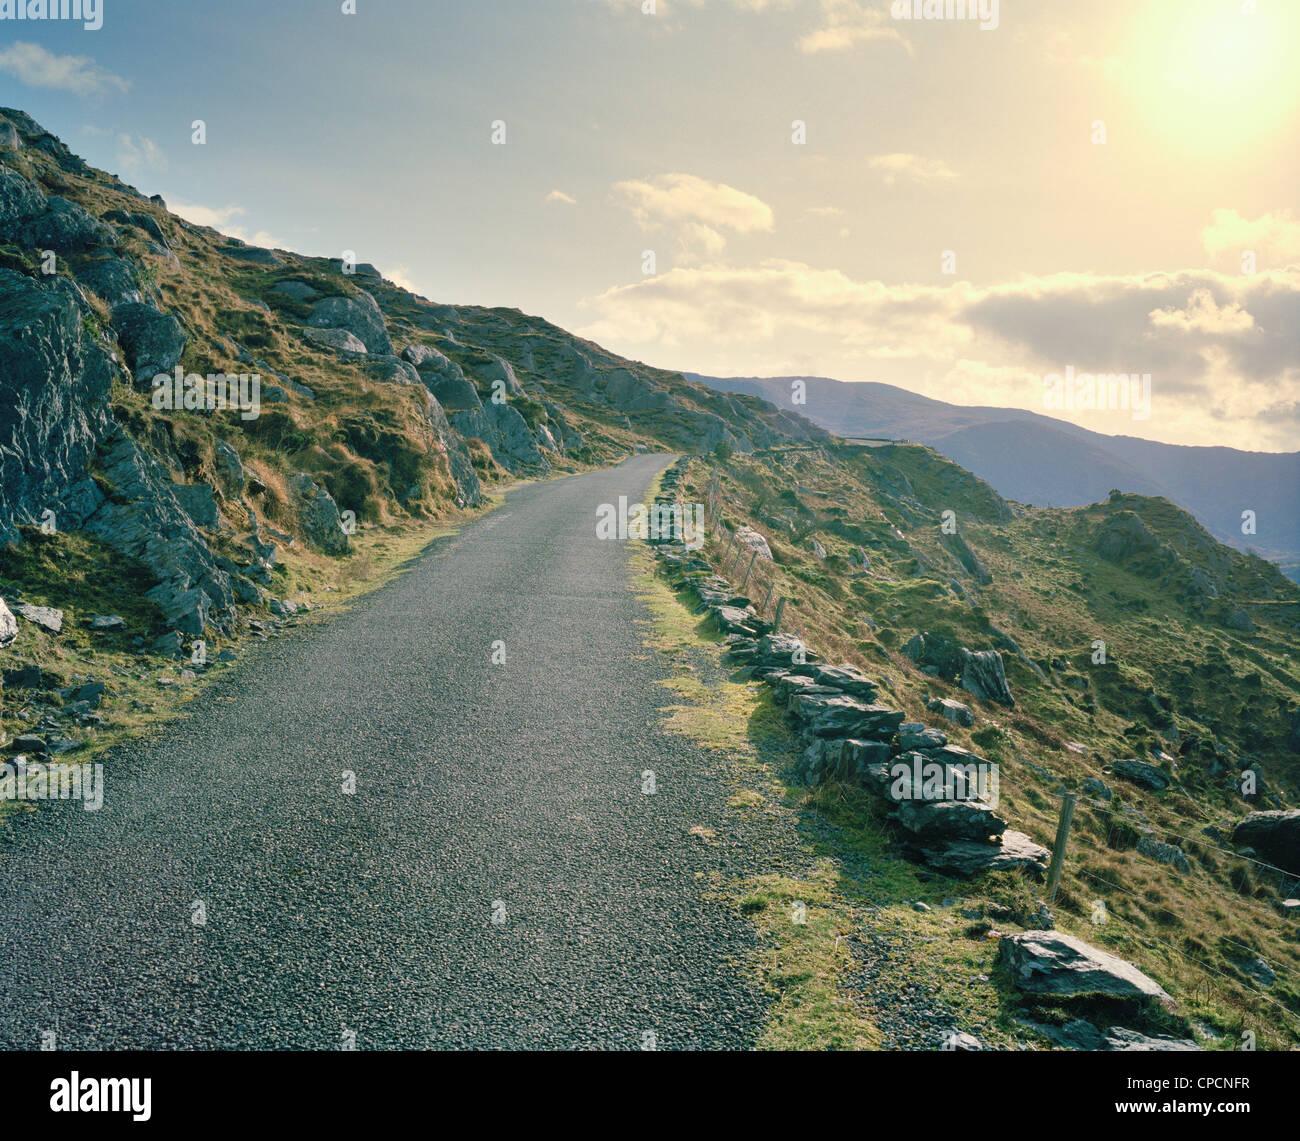 Pavimentada carretera rural en la montaña Imagen De Stock